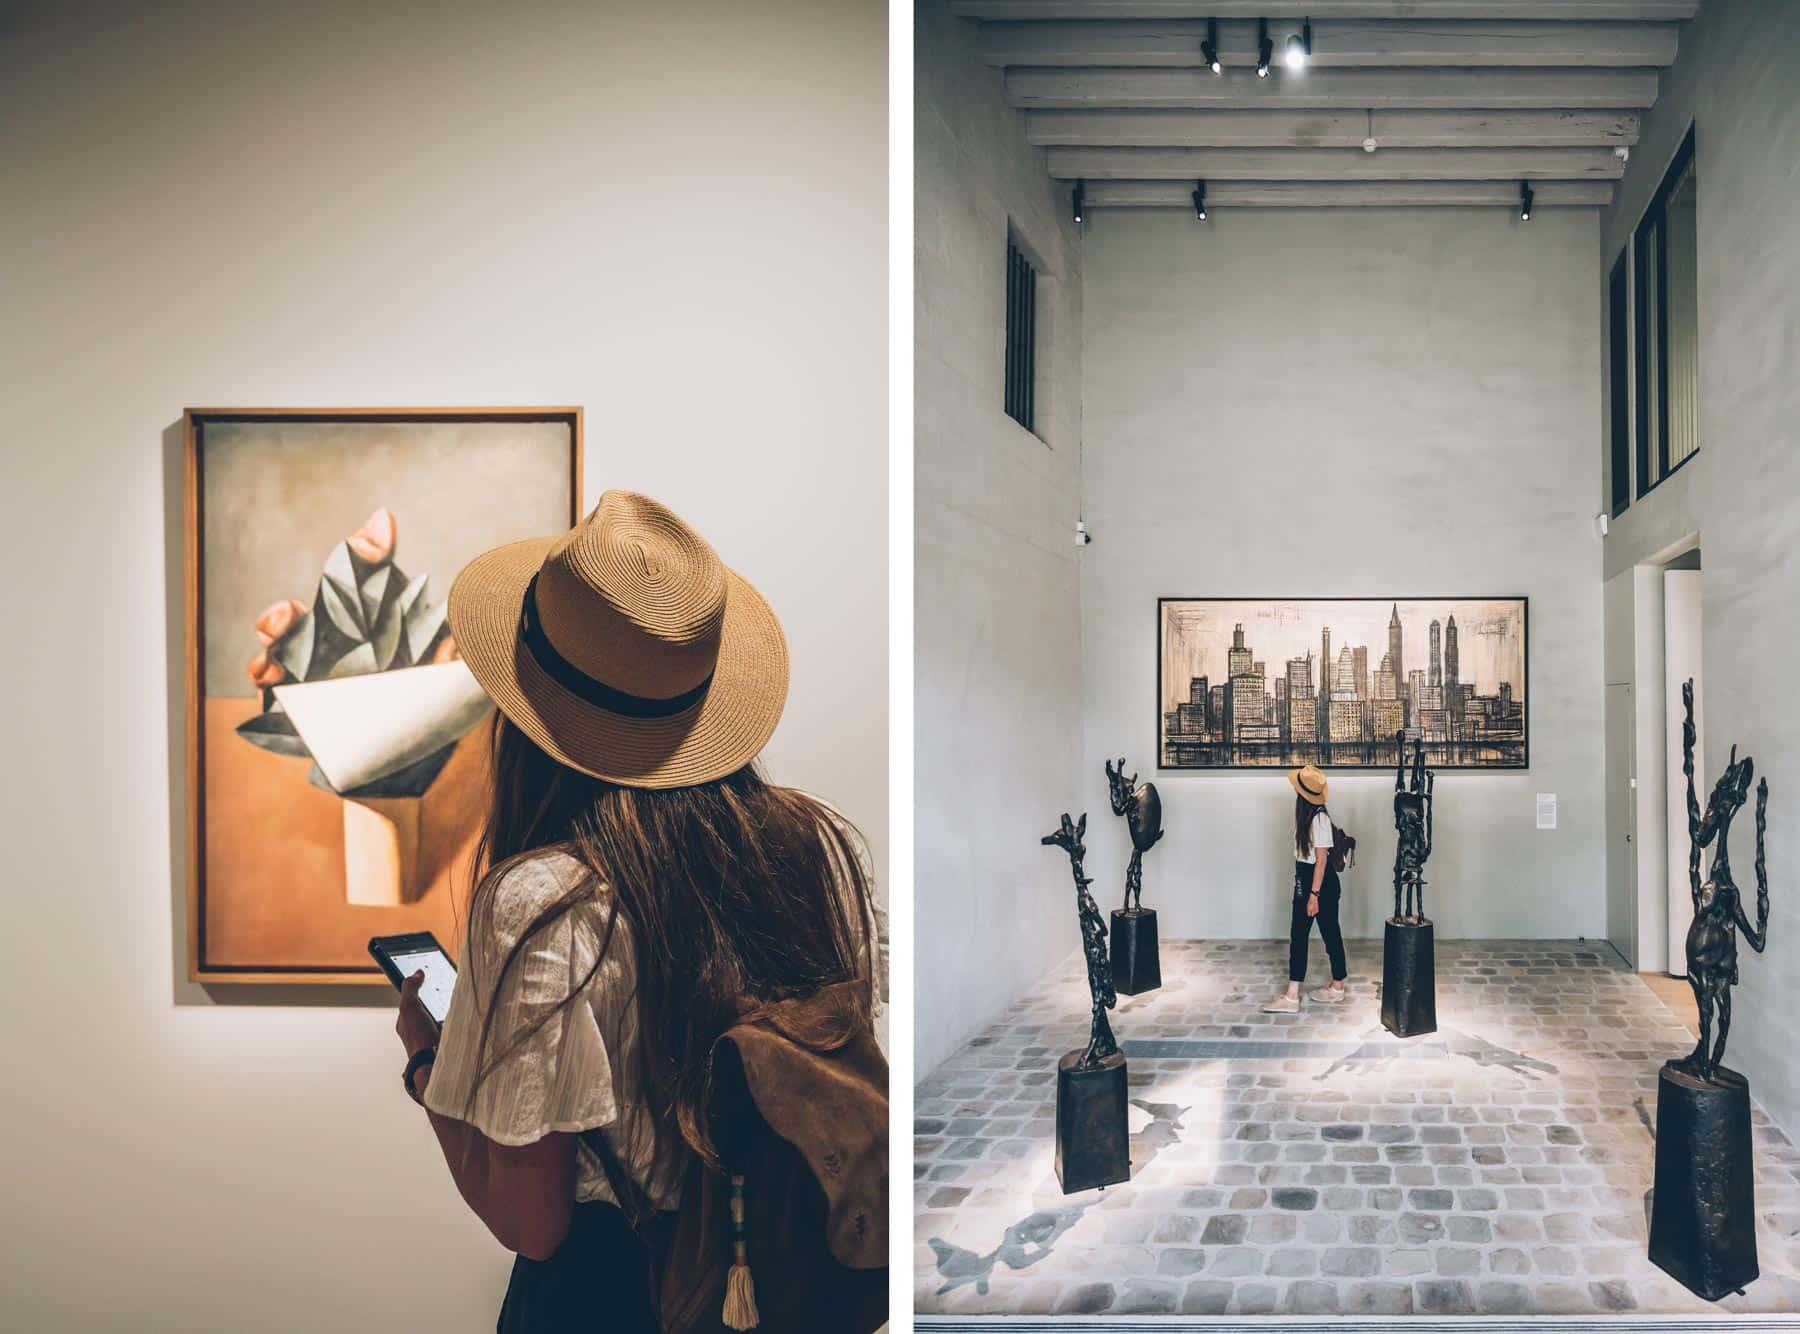 Musée d'Art Moderne, Abbaye Royale de Fontevraud